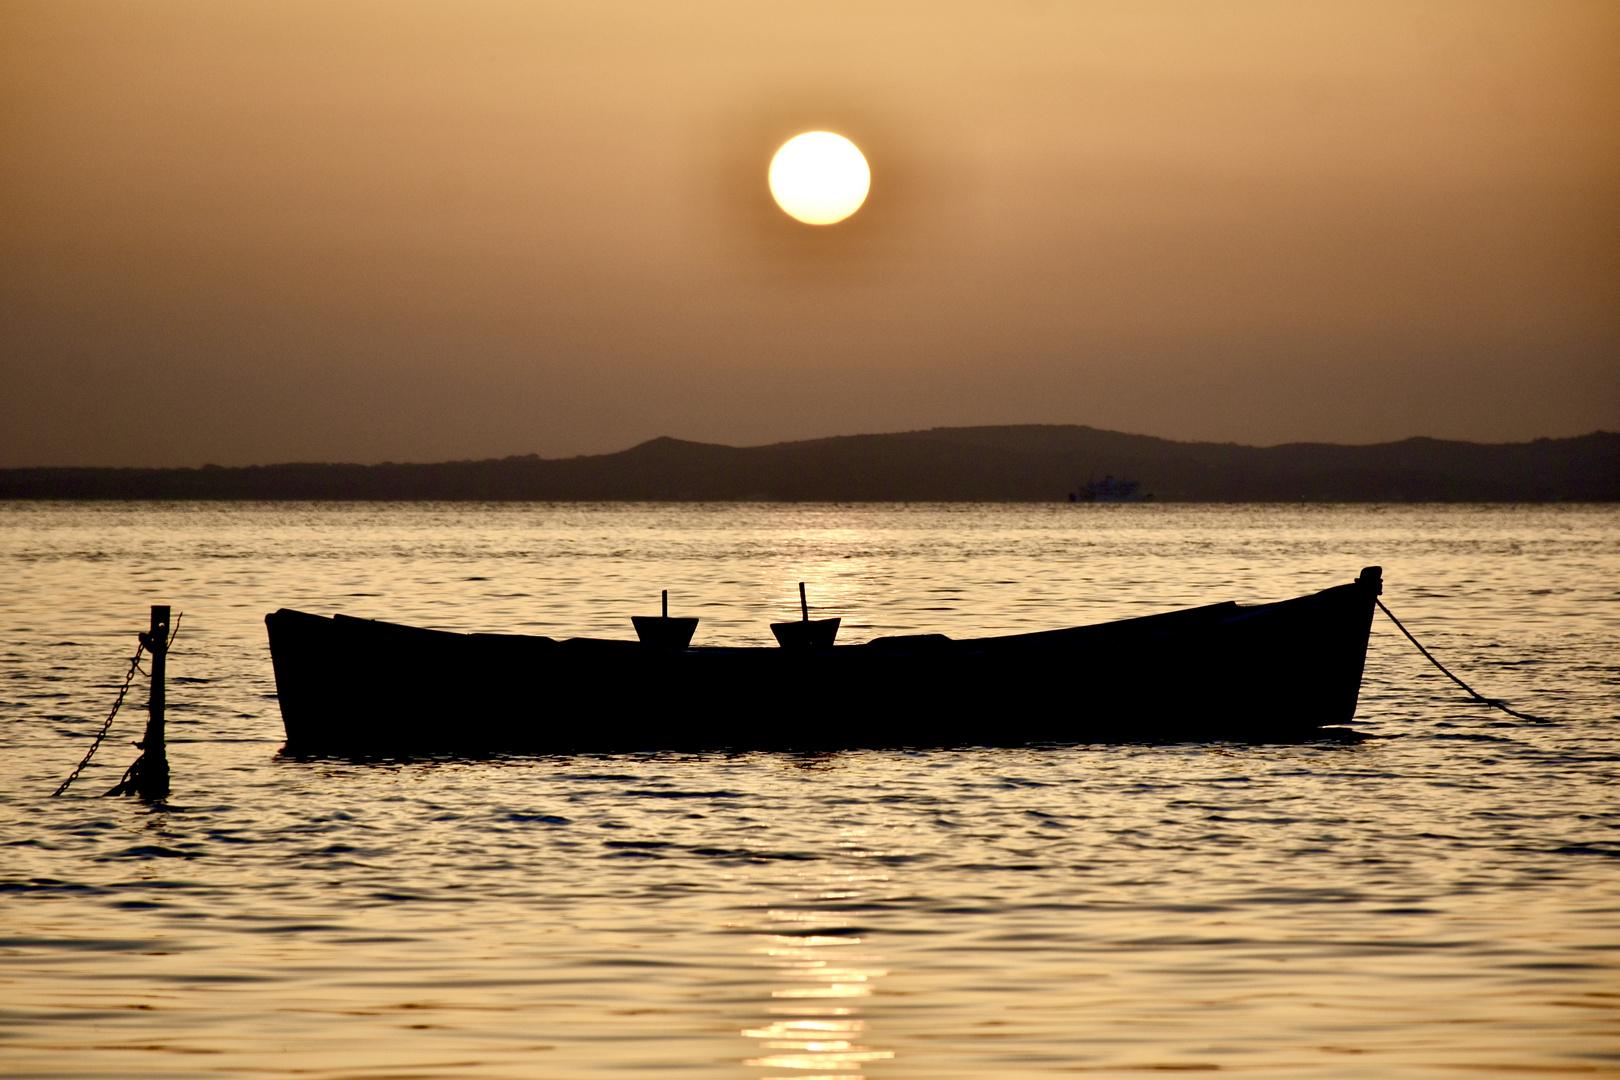 Barca al tramonto Corongiuali Matzaccara Sud Sardegna